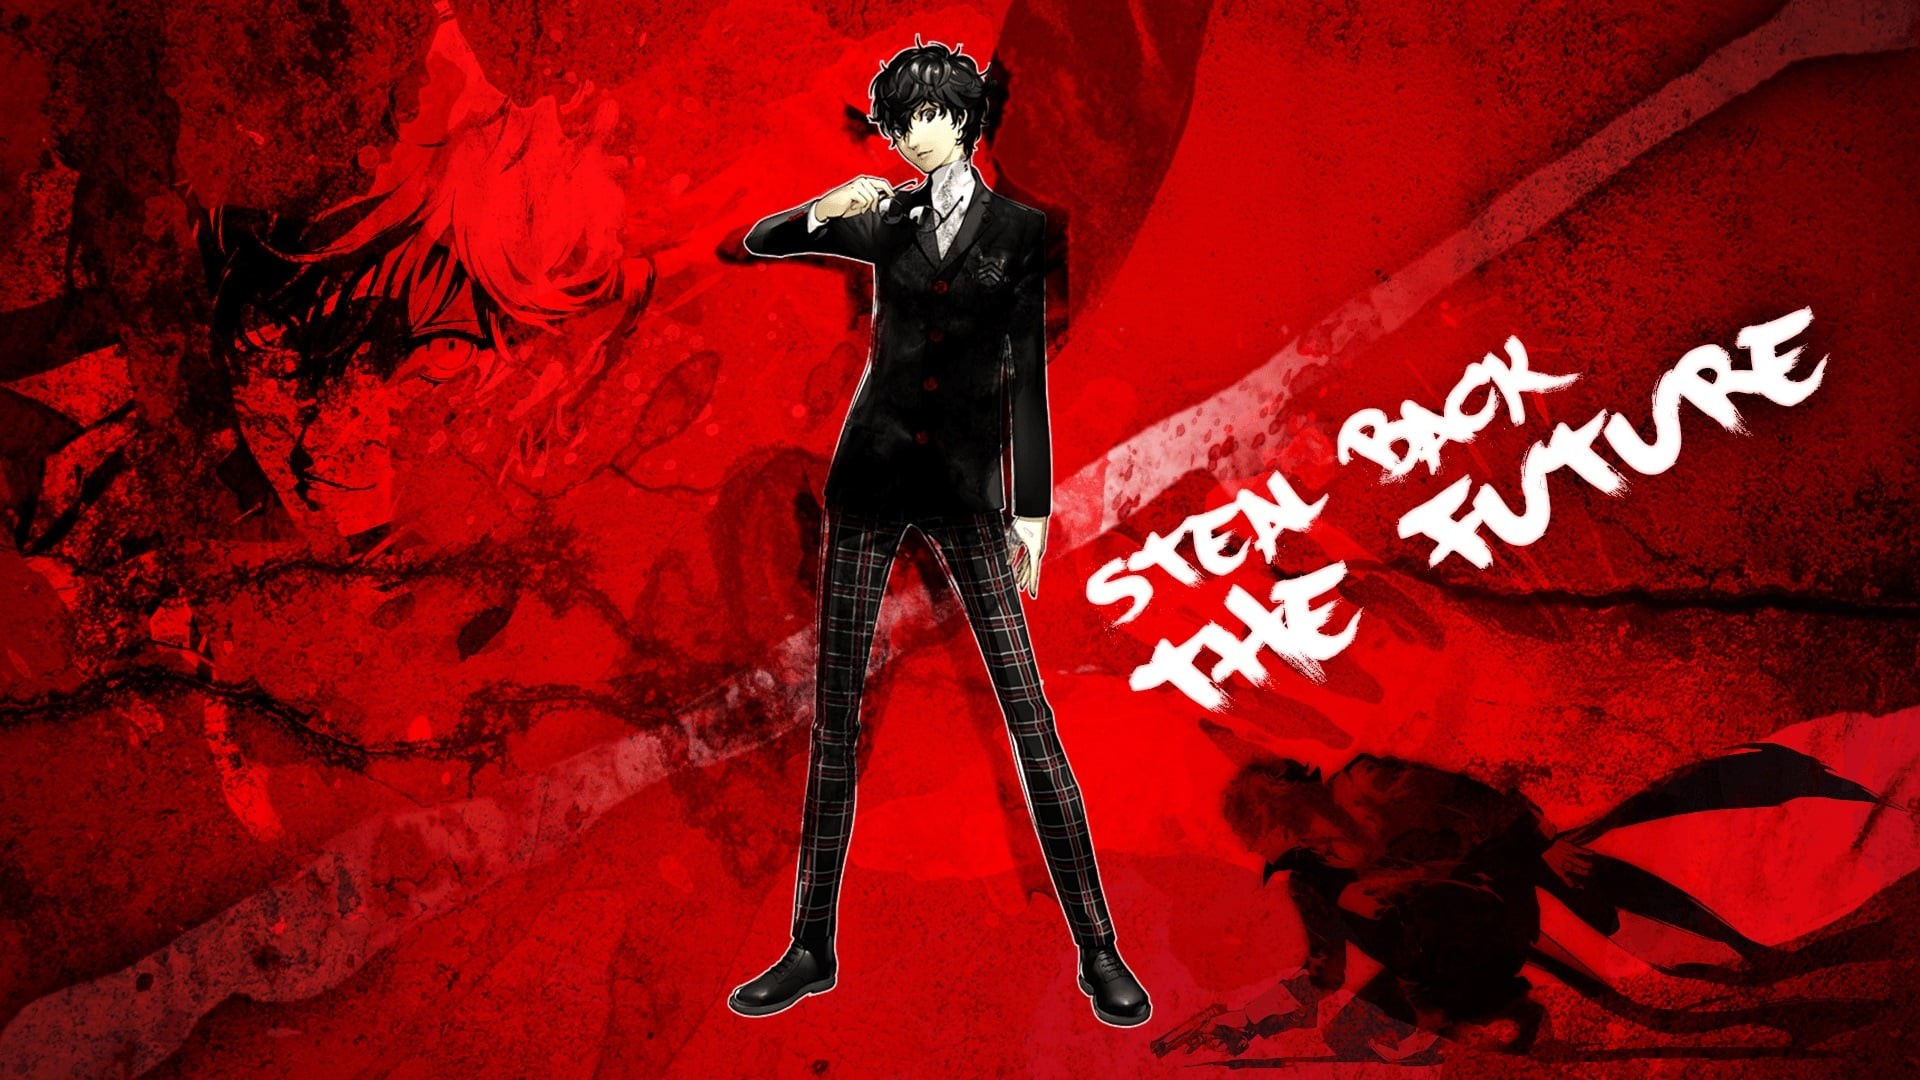 wallpaper of Persona 5 Protagonist for desktop